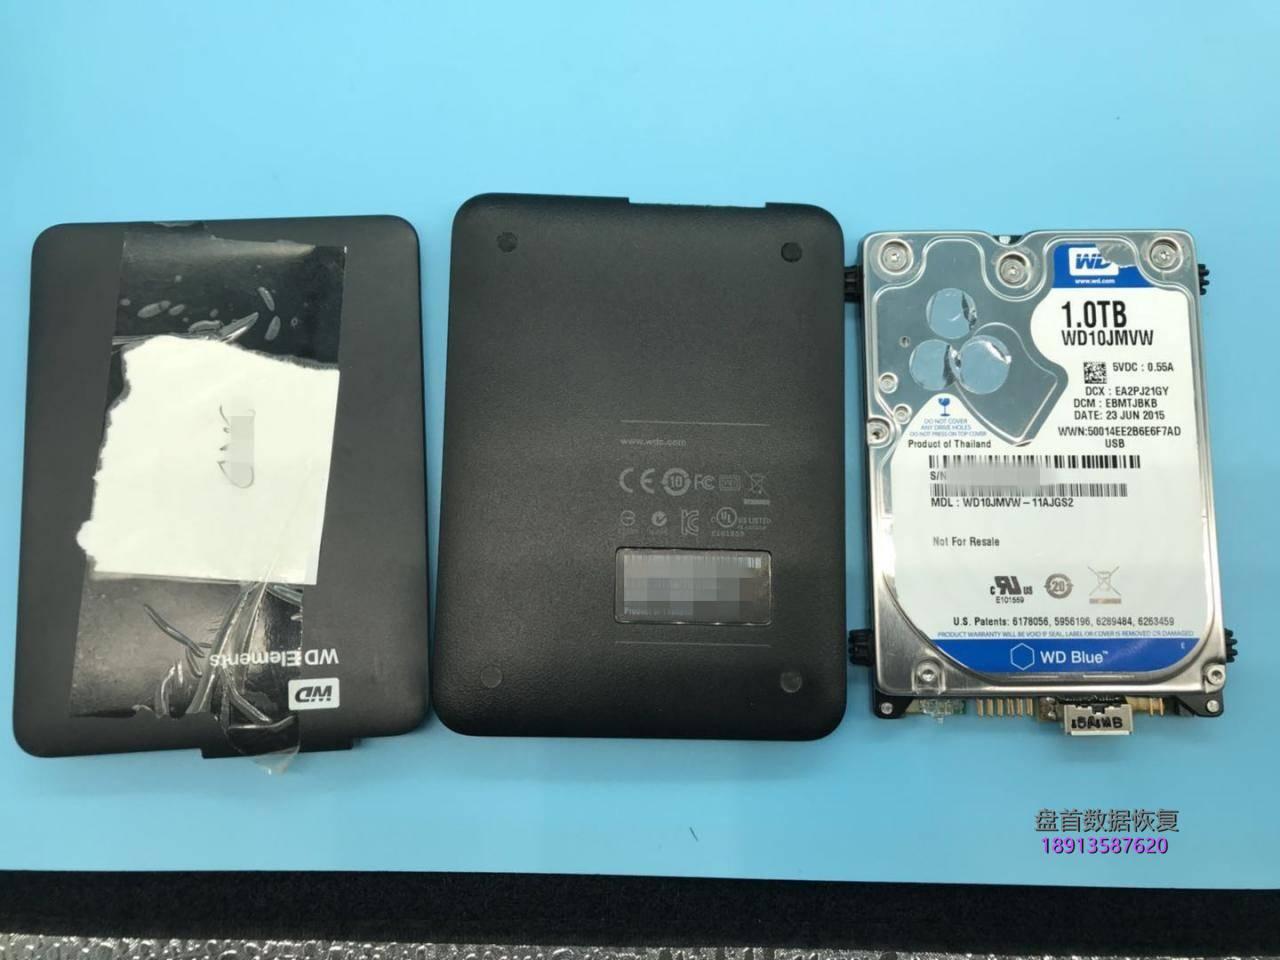 wd10jmvw-11ajgs2西部数据wd1tb移动硬盘二次开盘数据恢复成功 WD10JMVW-11AJGS2西部数据WD1TB移动硬盘二次开盘数据恢复成功